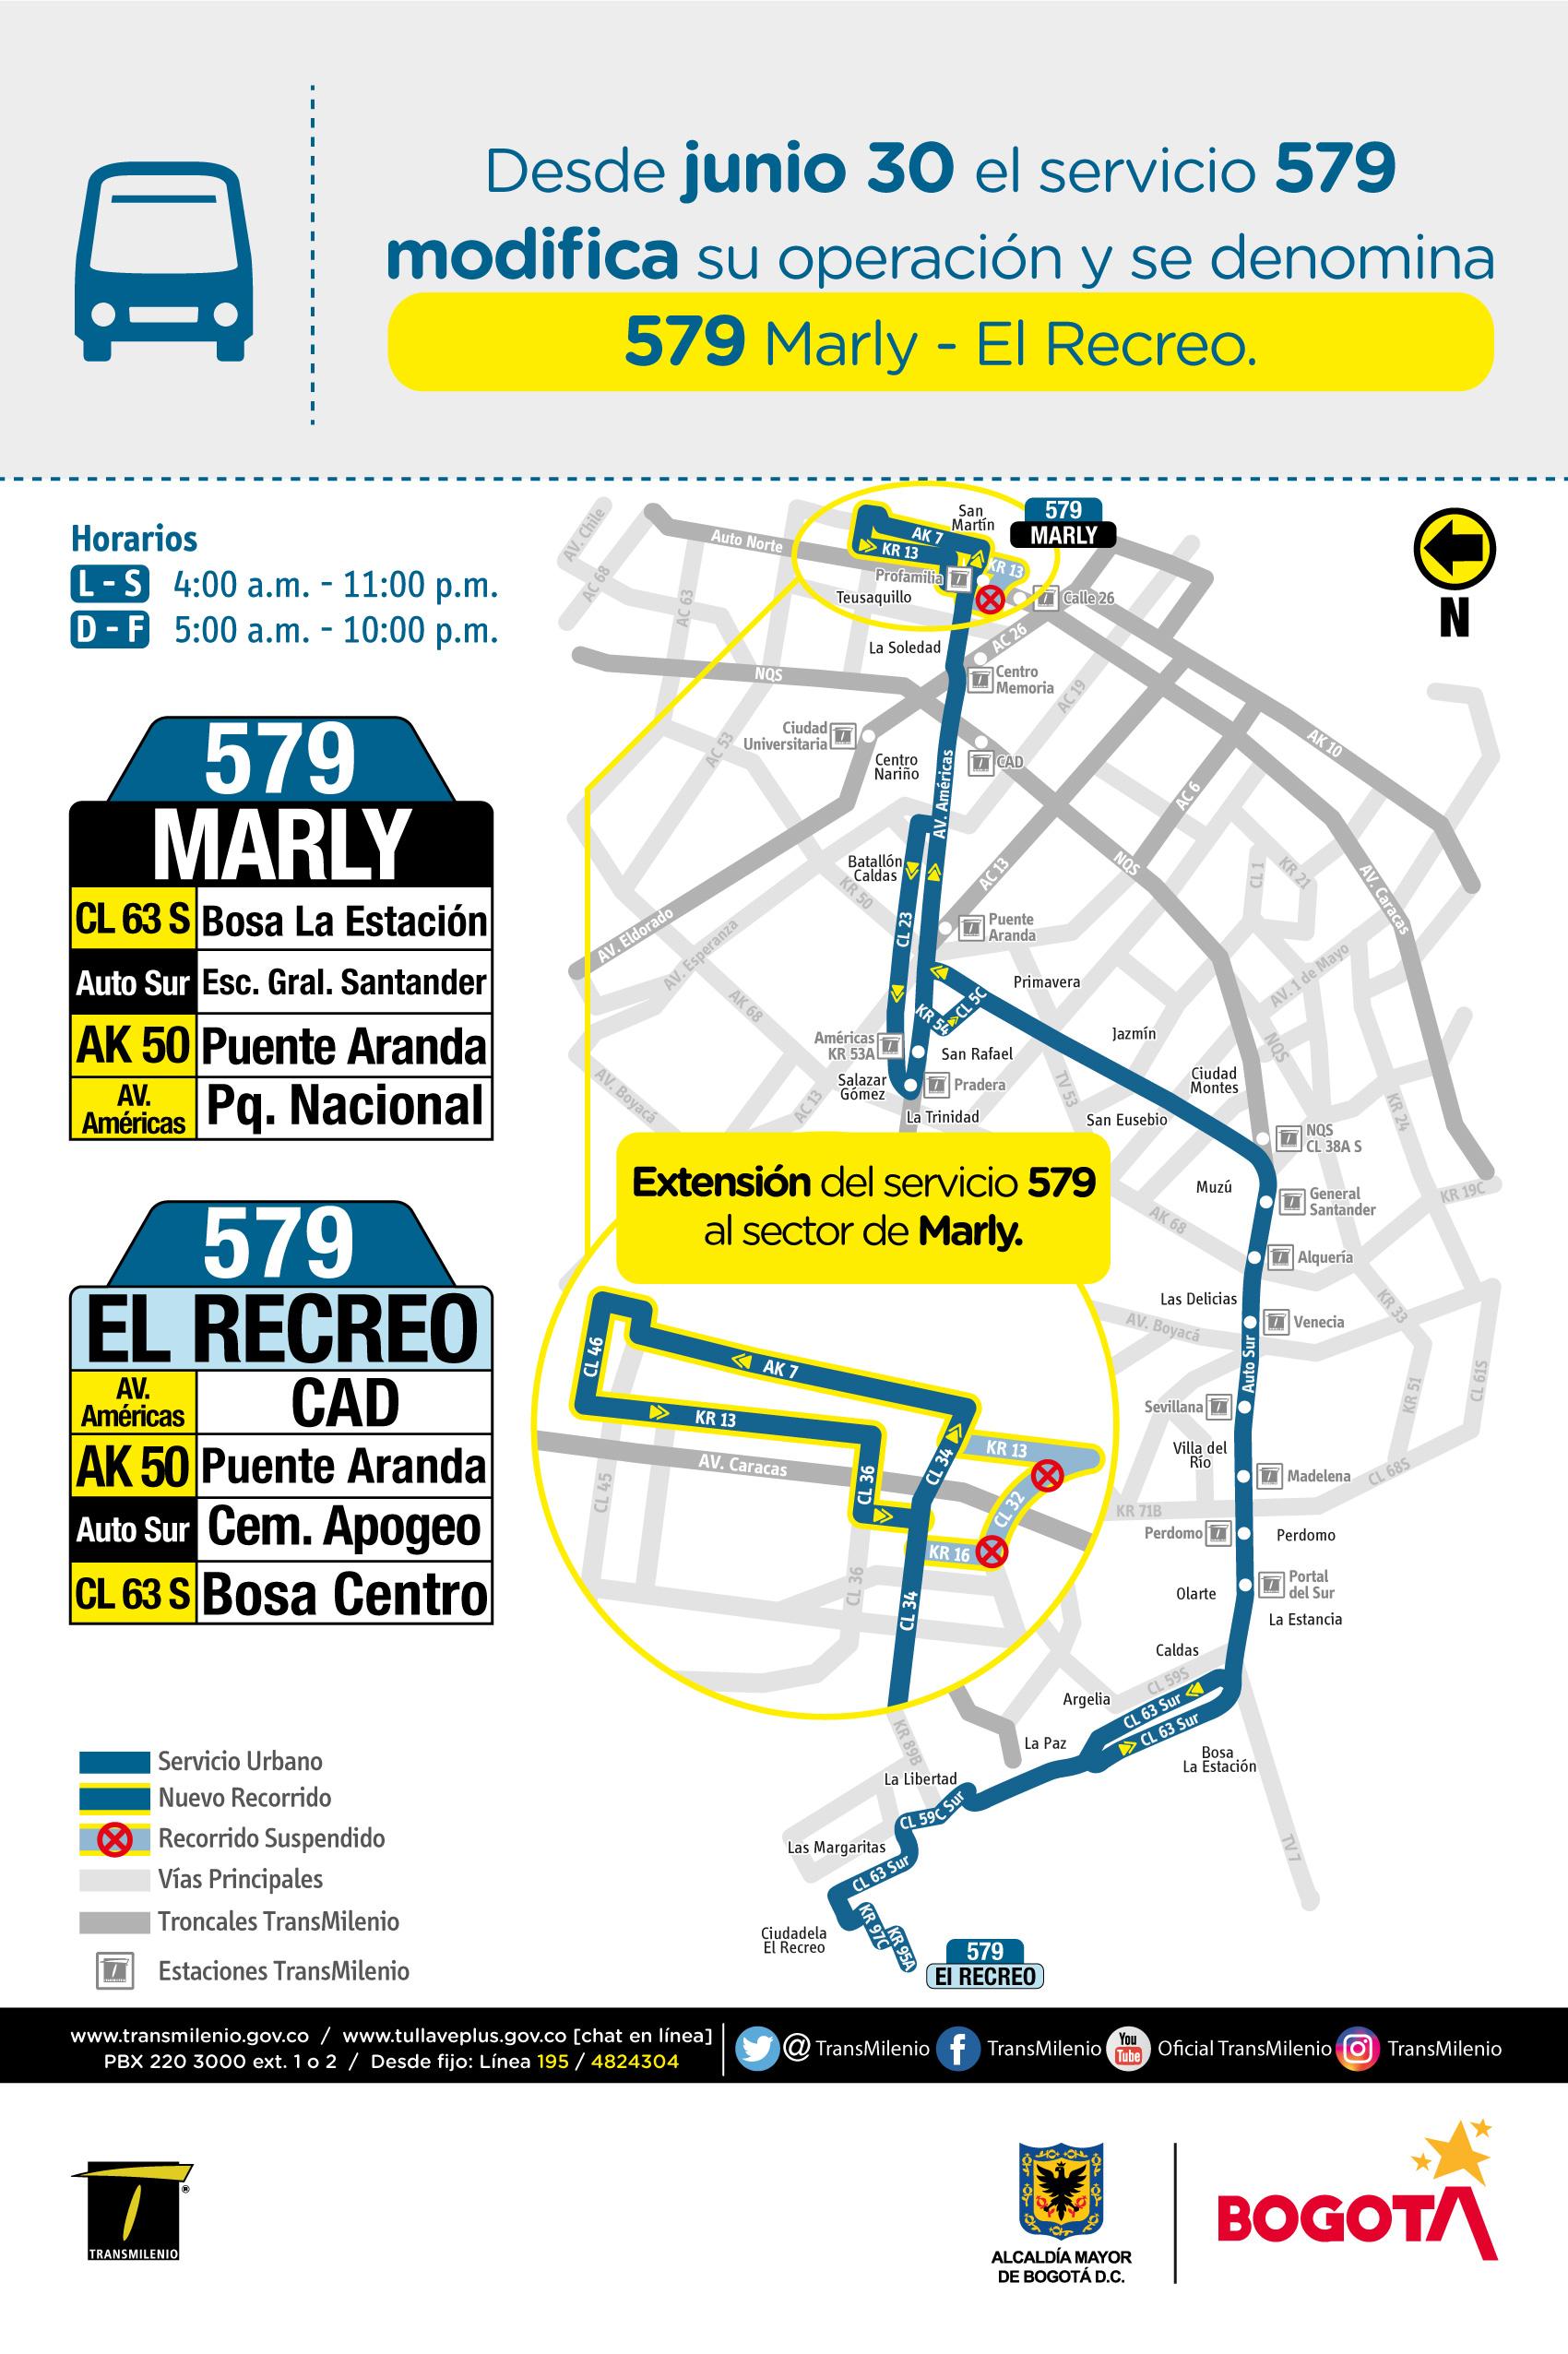 Mapa de la ruta 579 con modificaciones operacionales